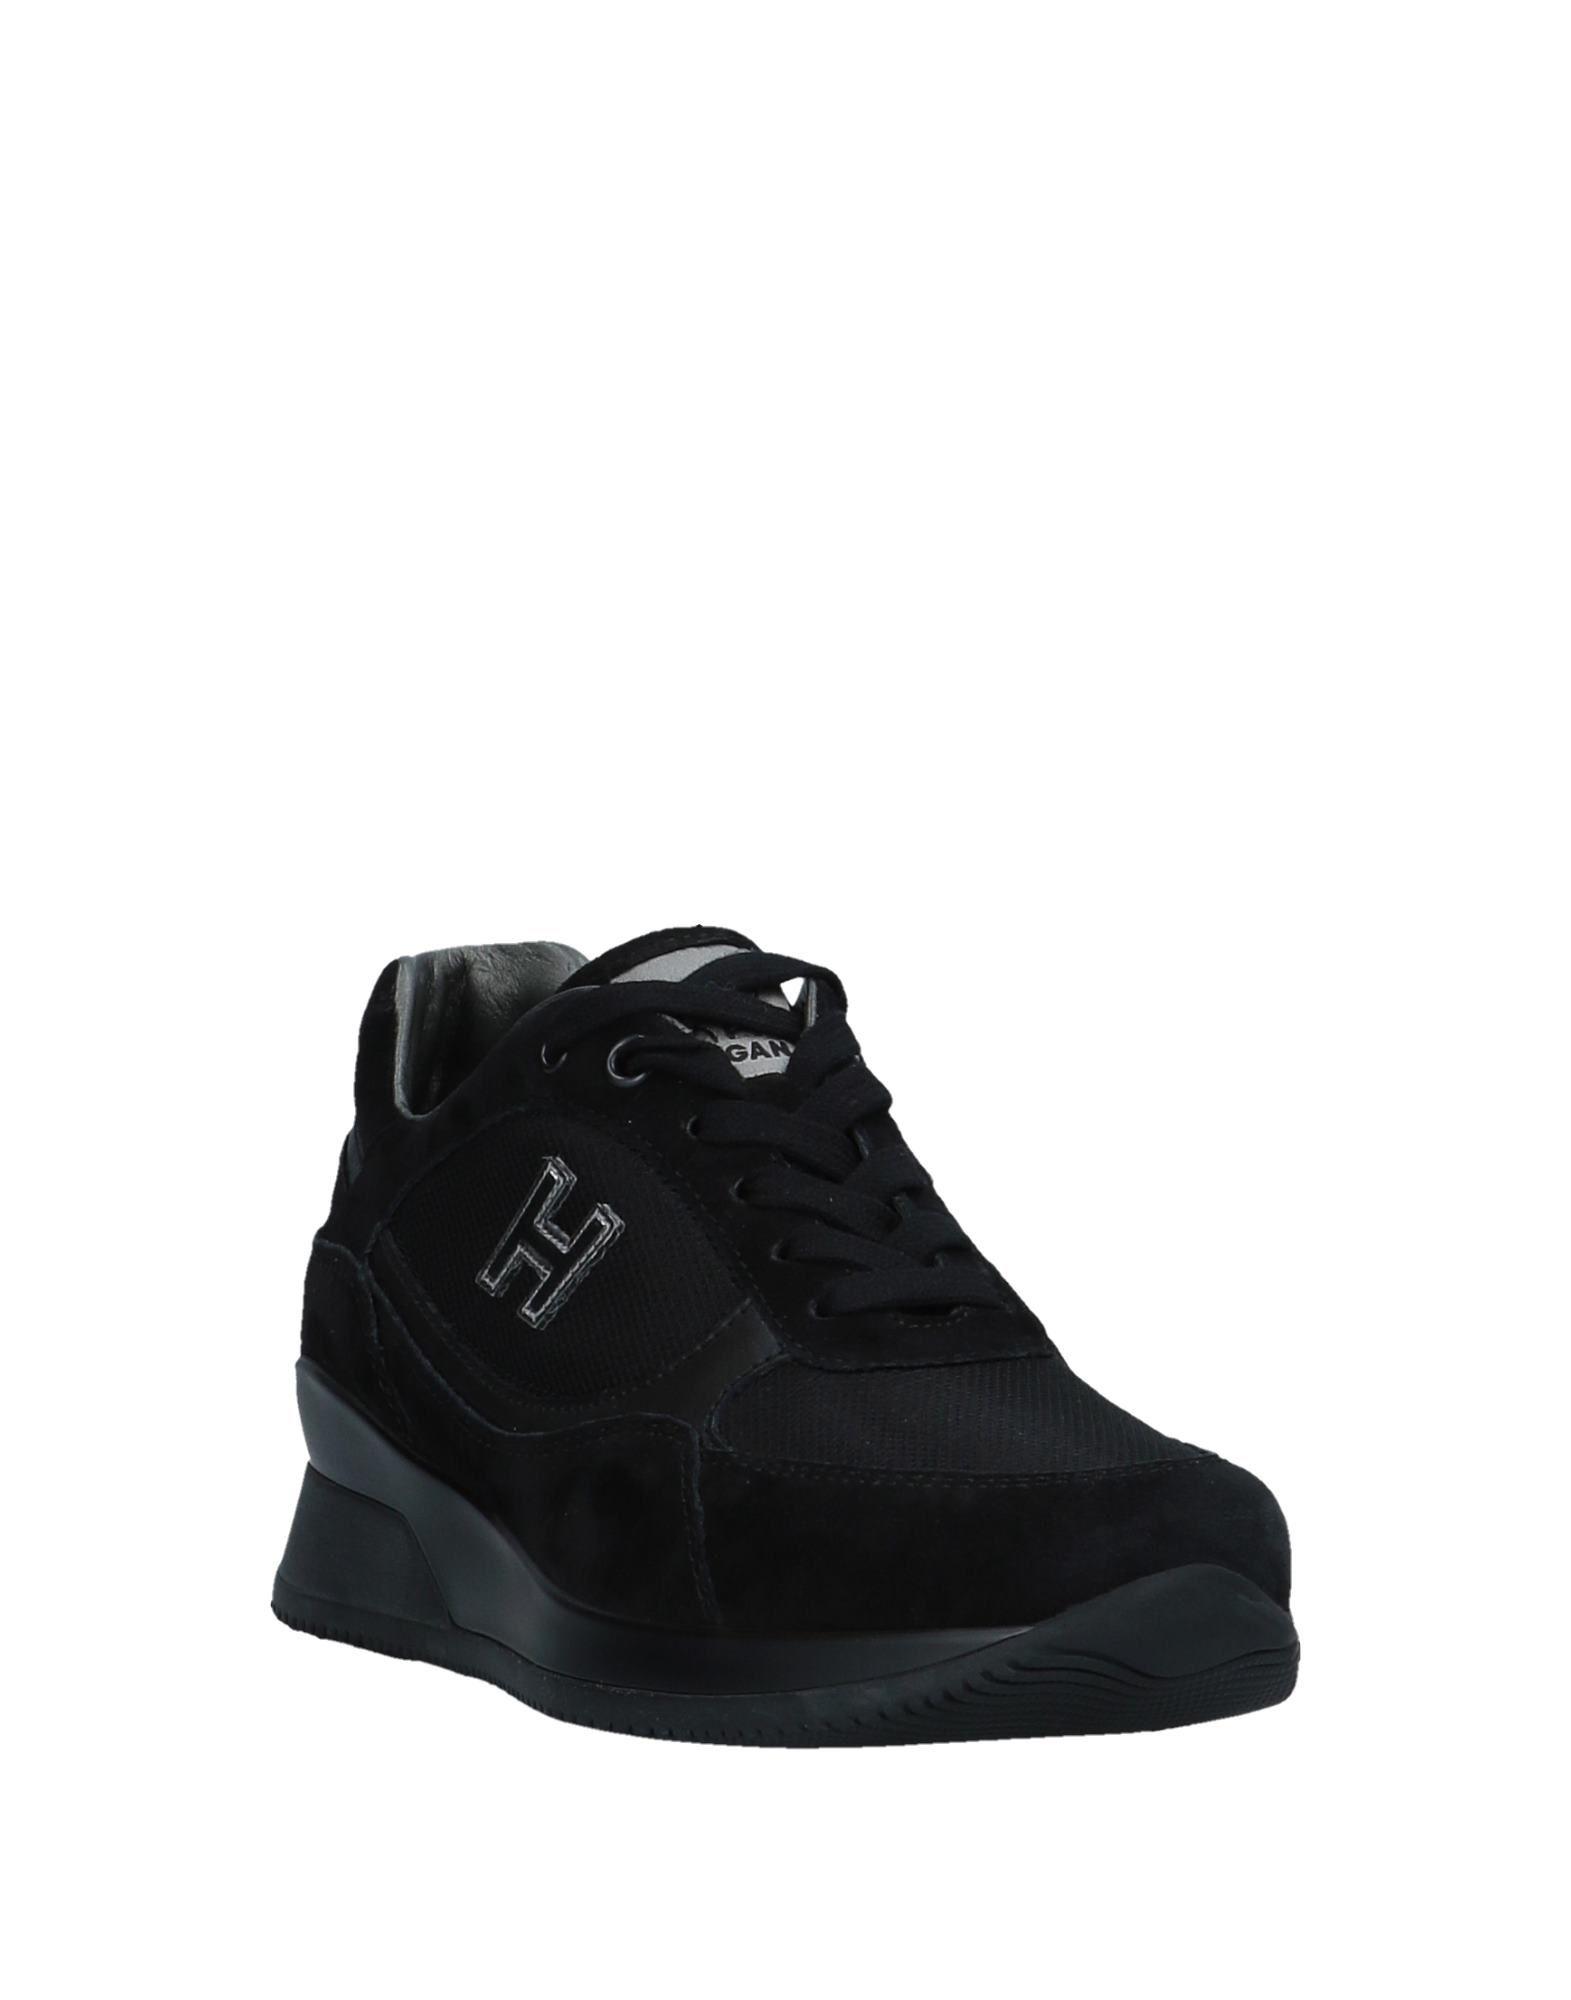 Rabatt  Schuhe Hogan Sneakers Damen  Rabatt 11540062OT 6937bd